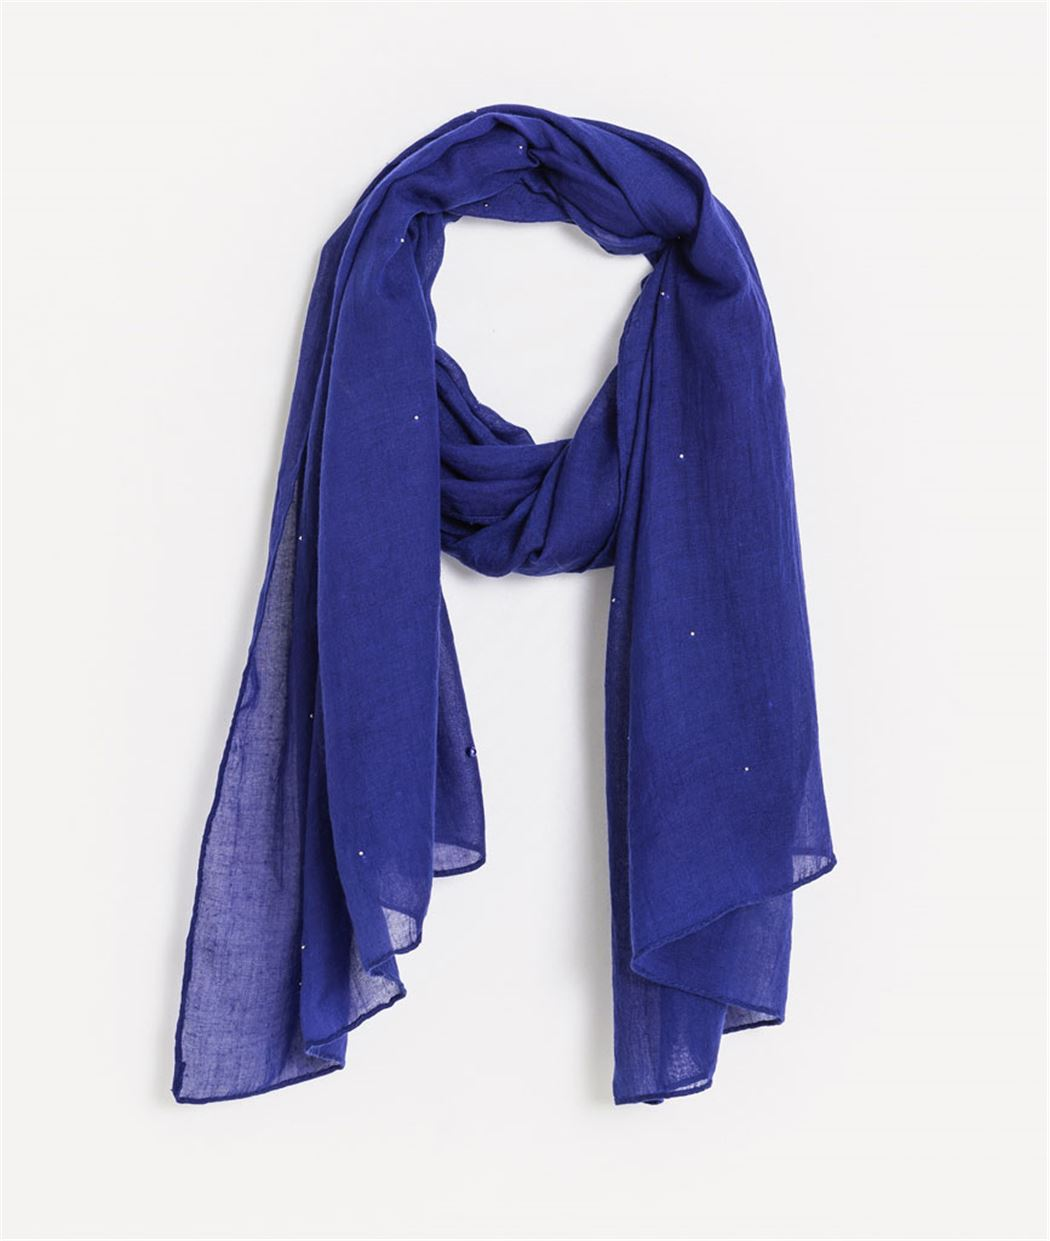 Foulard femme bleu uni avec perles KLEIN